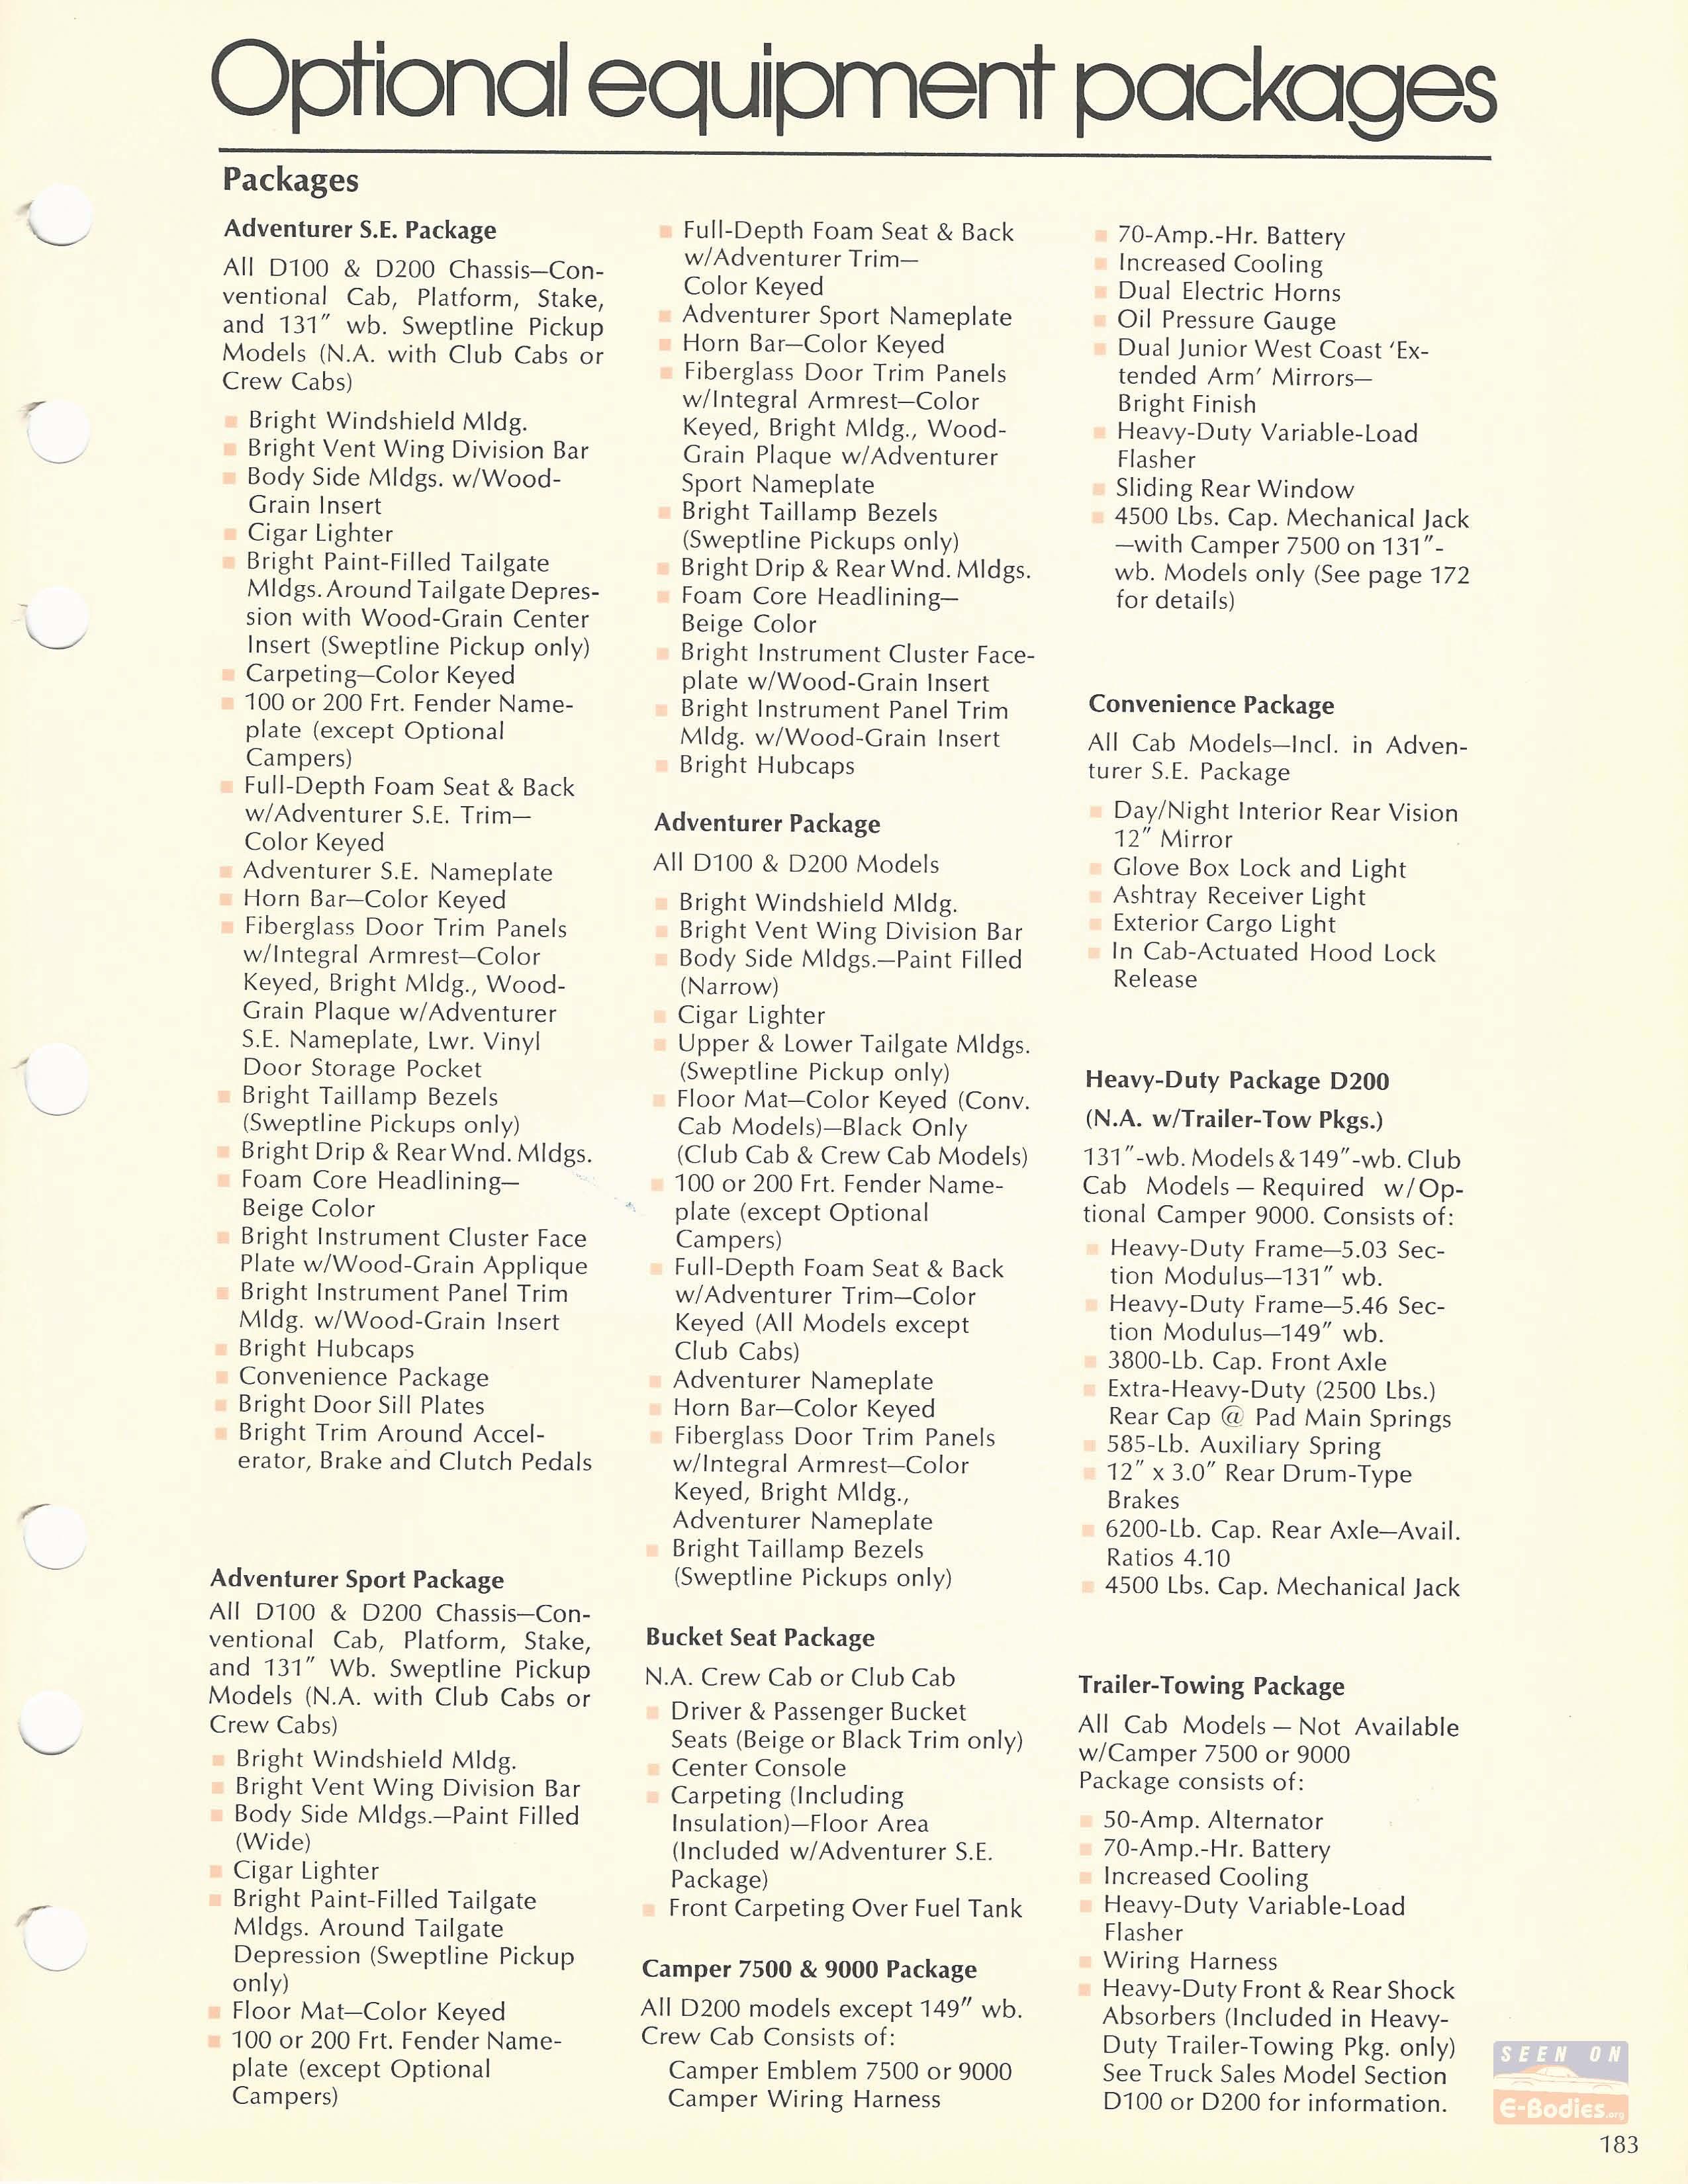 1973_Dodge_Data_Book_Trucks (27)